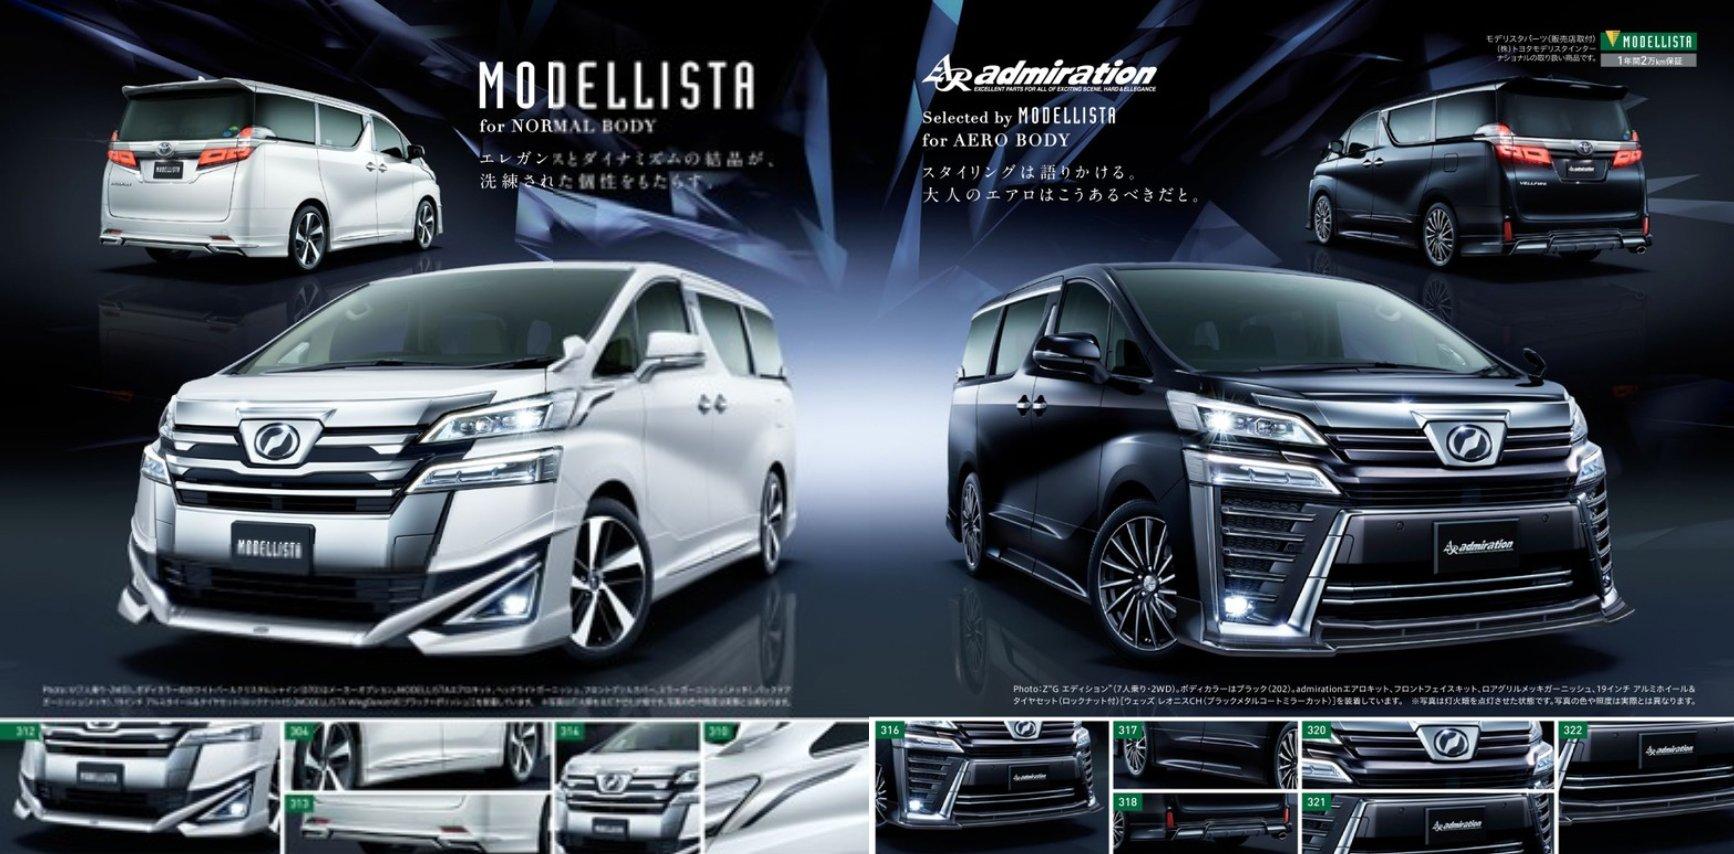 Toyota Vellfire Alphard 2018 Kit Modellista Trd Baru